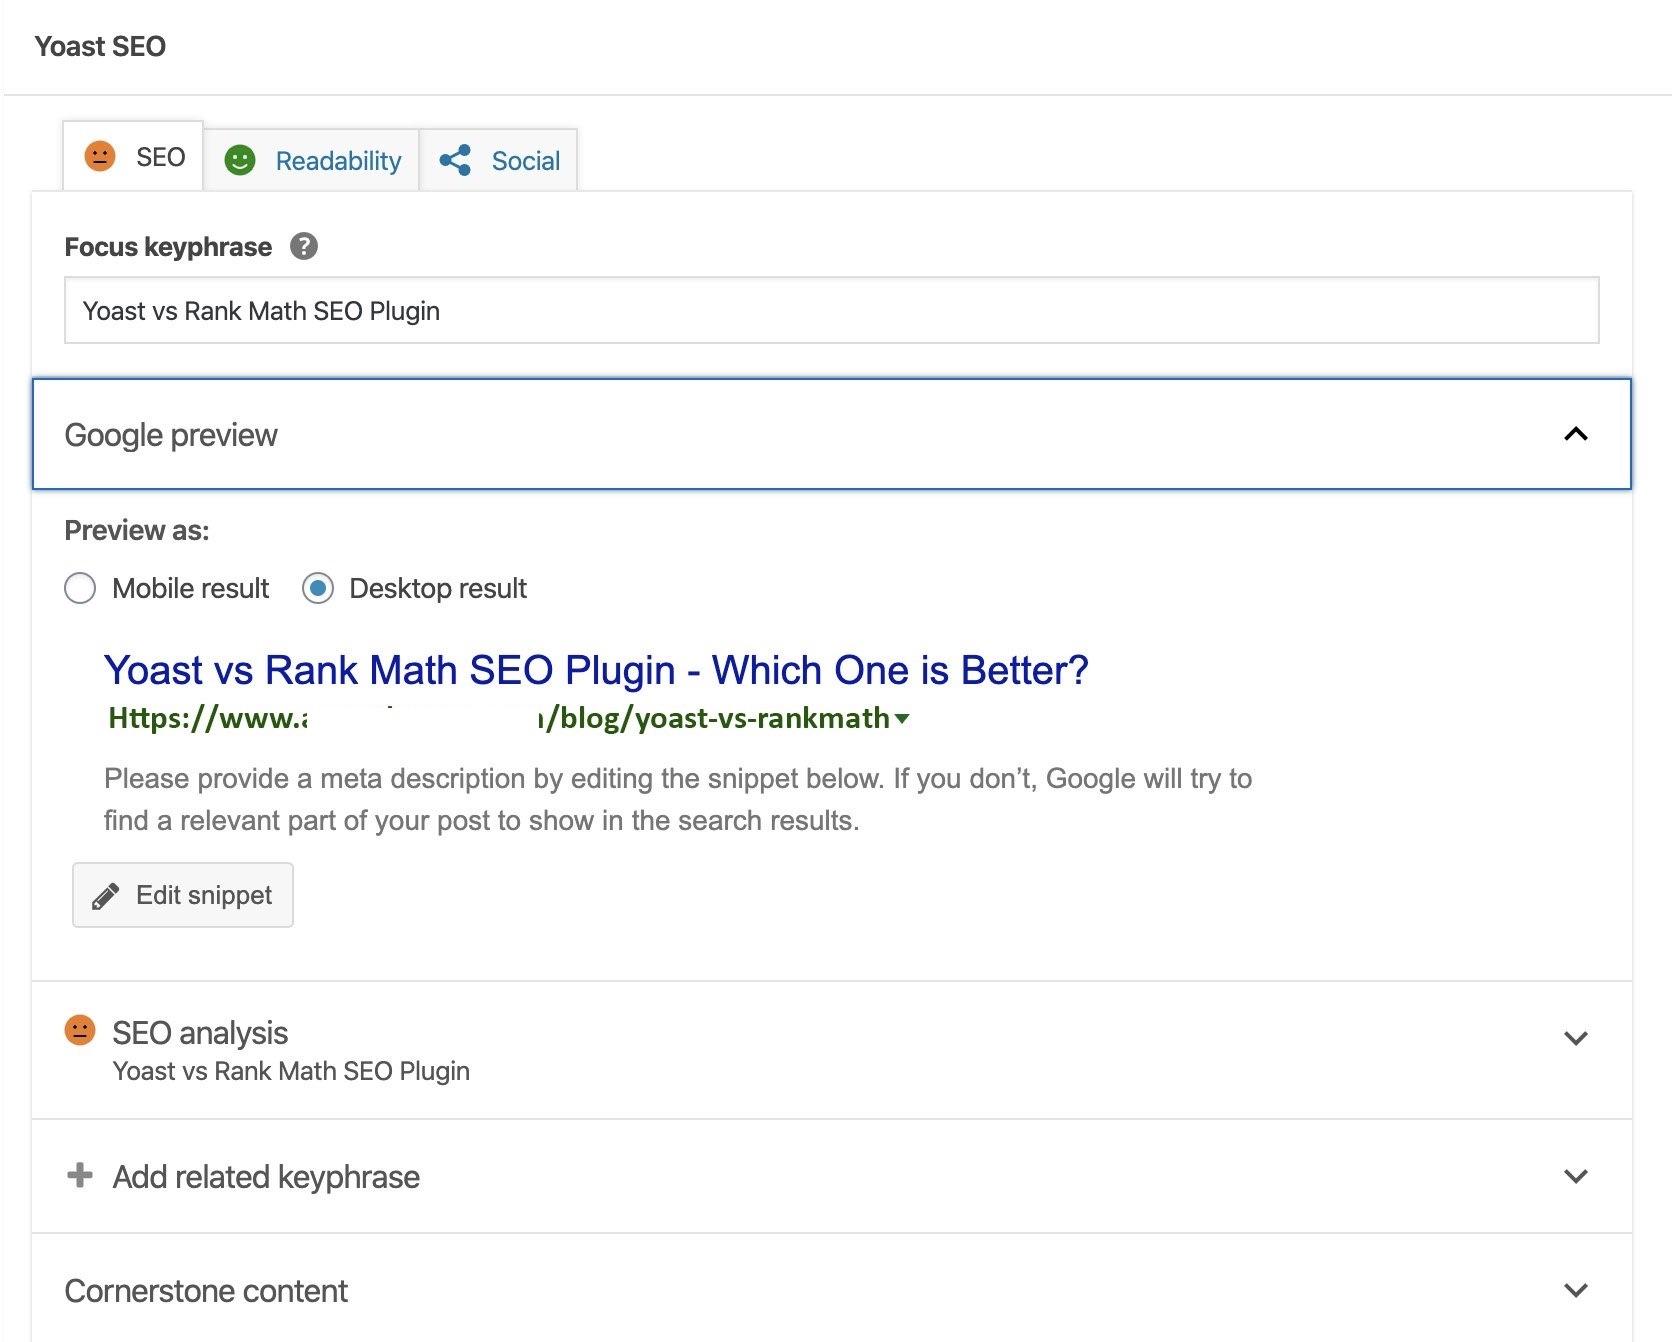 Plugin Yoast vs Rank Math SEO vs All In One SEO - Cái nào tốt hơn? 5